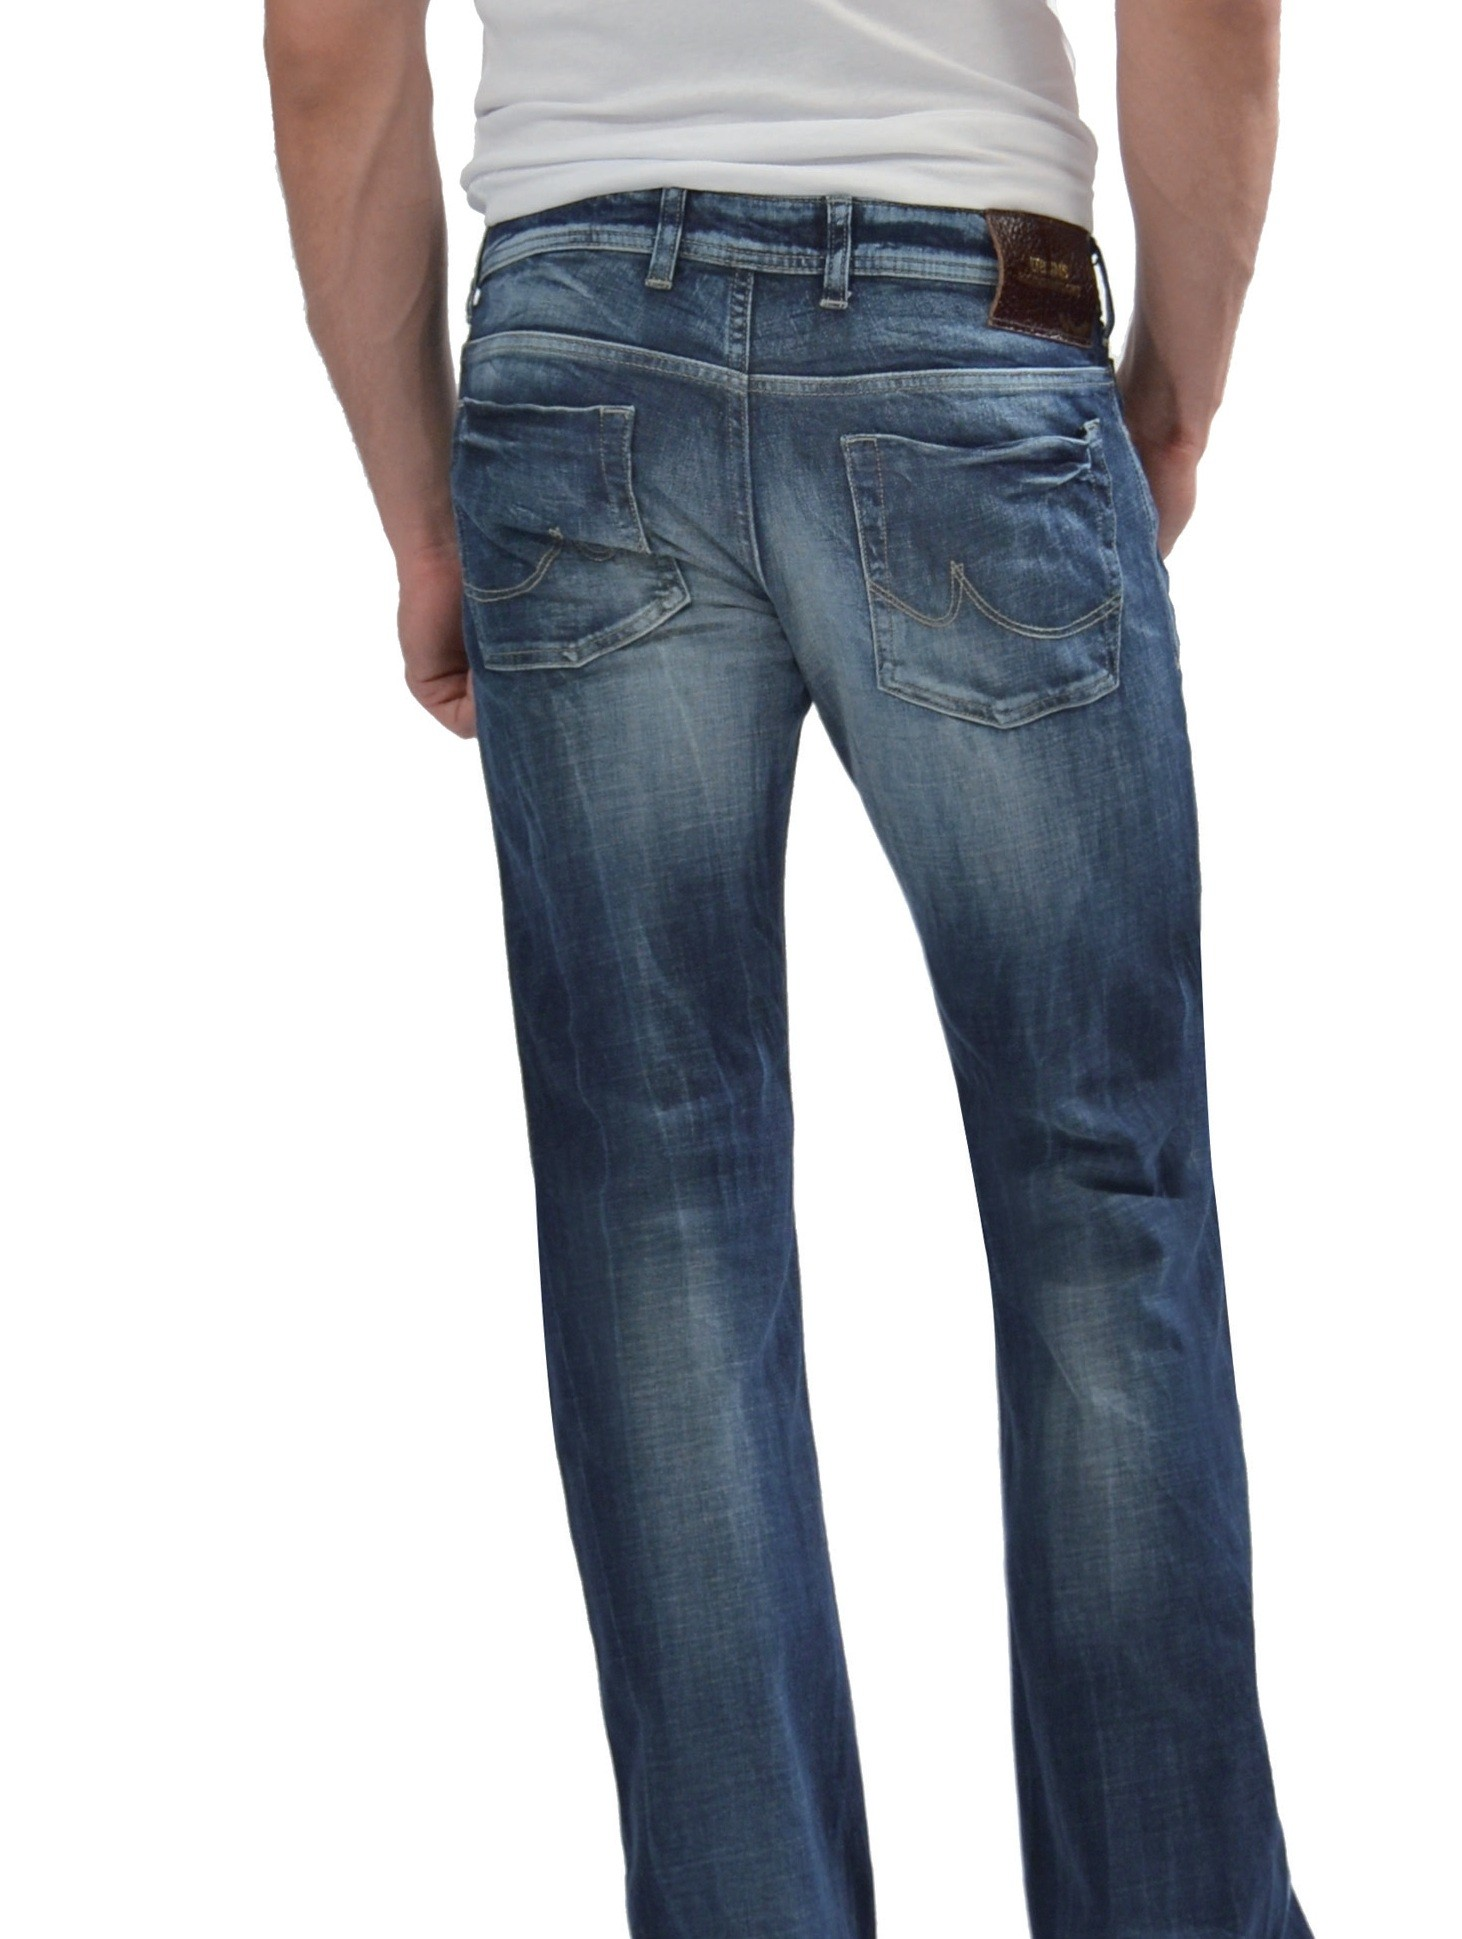 ltb herren jeans tinman bootcut dunkelblau kaufen. Black Bedroom Furniture Sets. Home Design Ideas